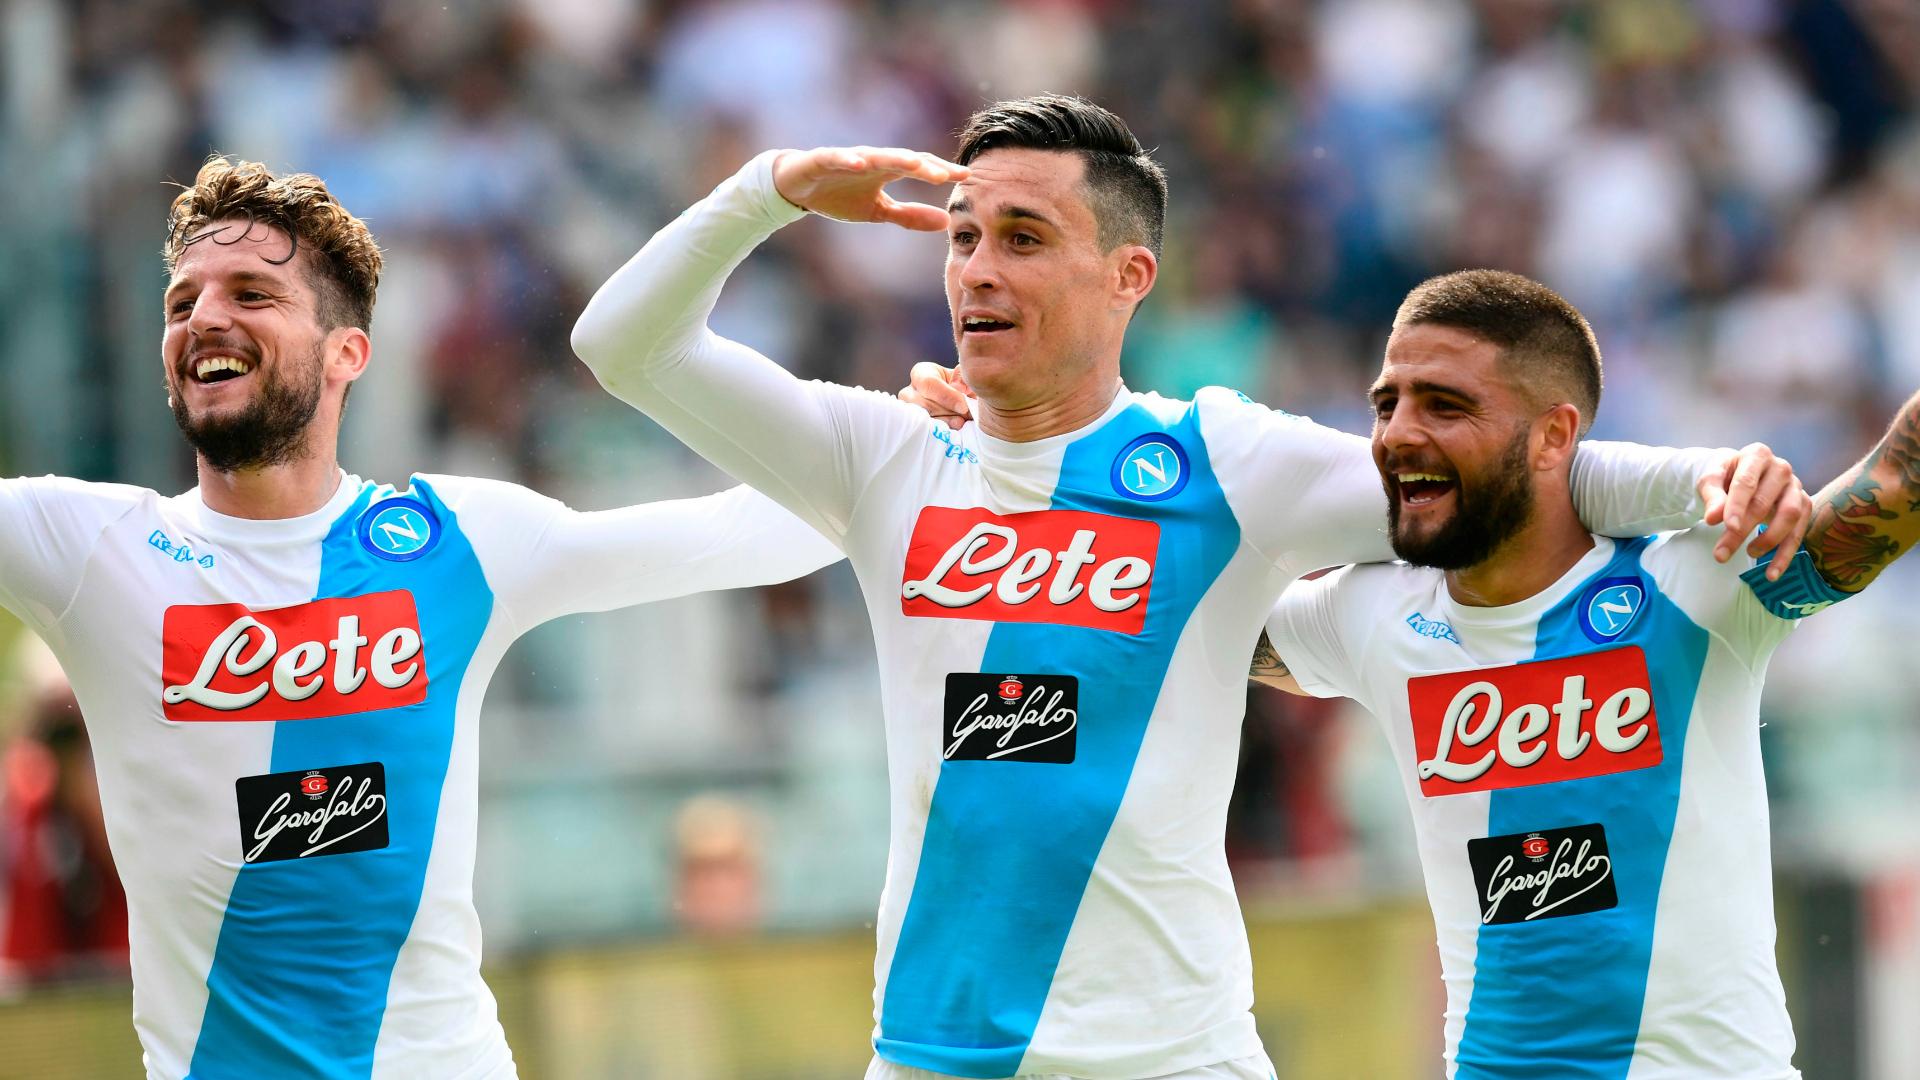 Napoli players celebrating Serie A 2016-17